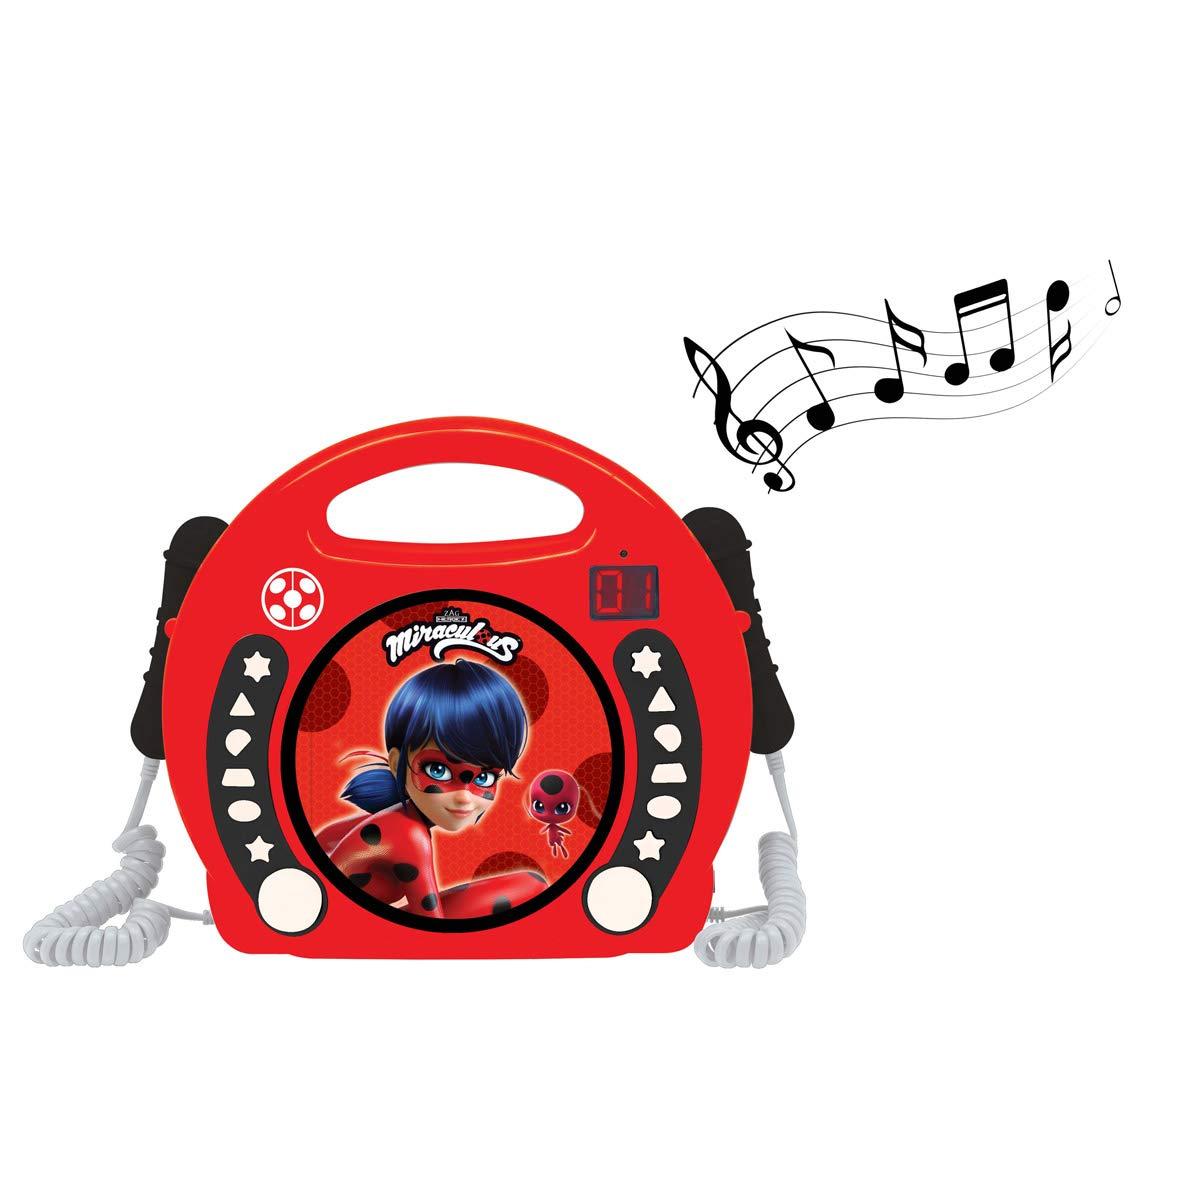 LEXiBOOK Miraculous Ladybug Radio CD, Programming Function, Headphones Jack, for Kids, with Power Supply or Batteries, Red/Black, RCDK100MI by LEXiBOOK (Image #3)